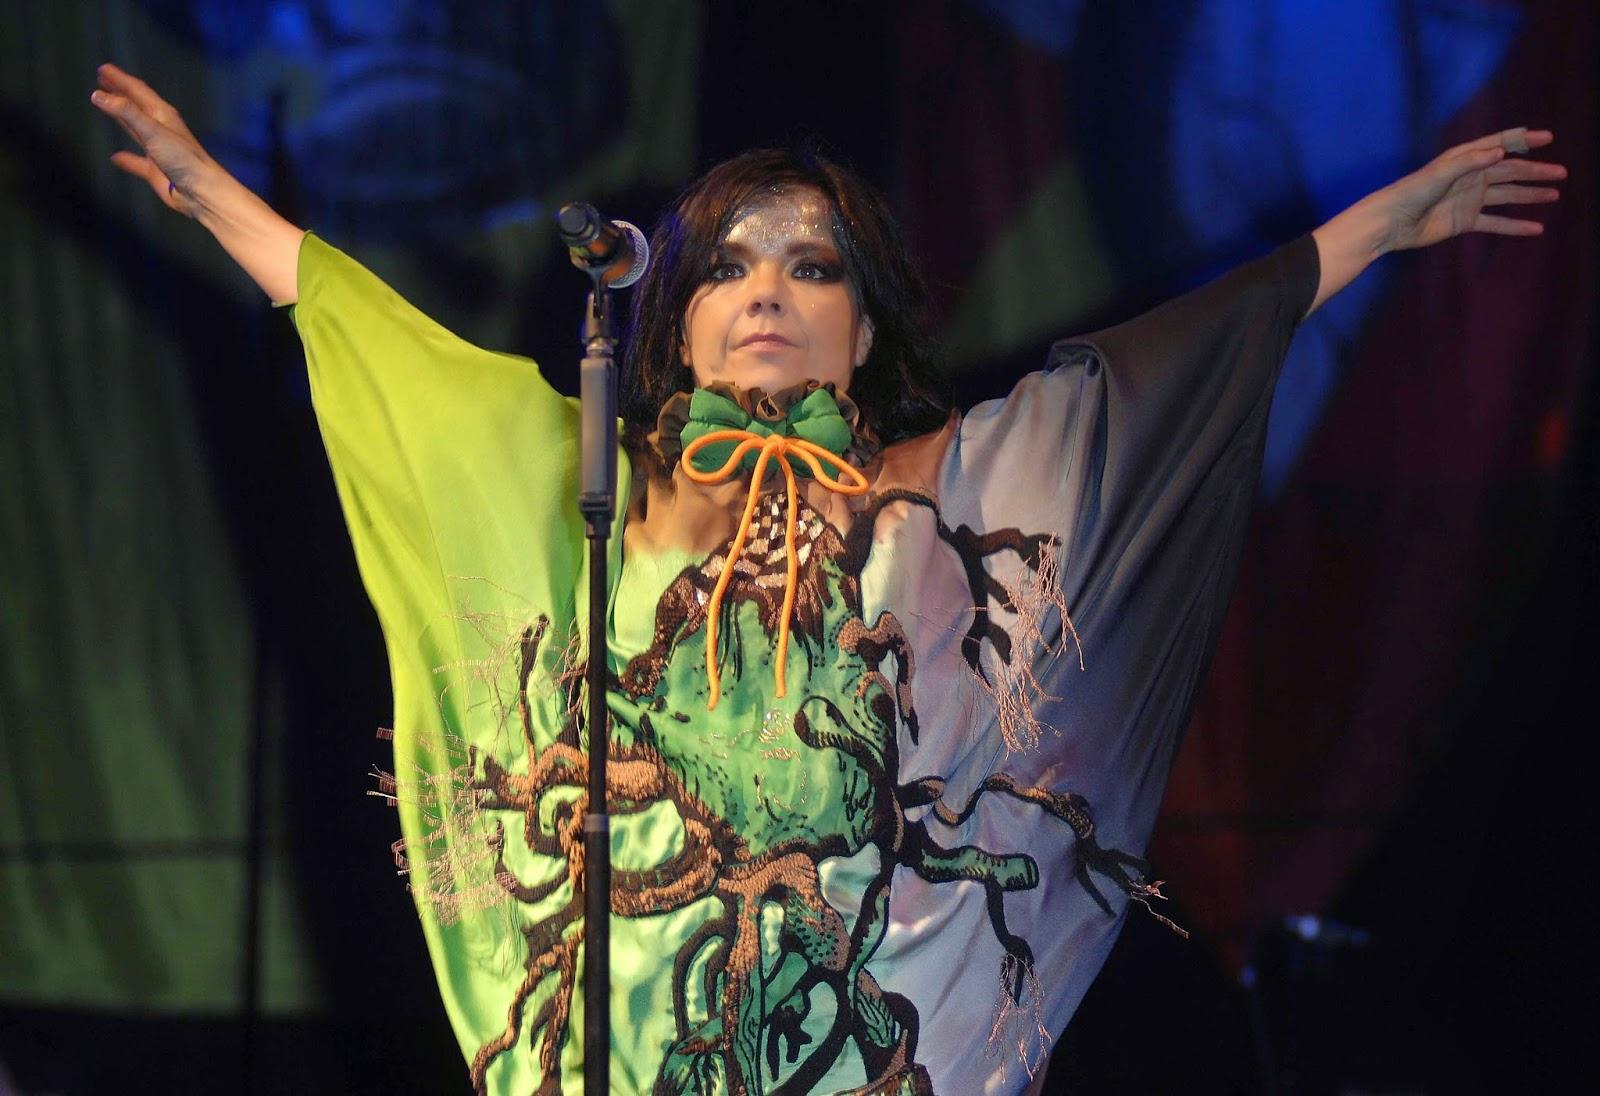 At Glastonbury Festival (Live) - Album by Björk | Spotify